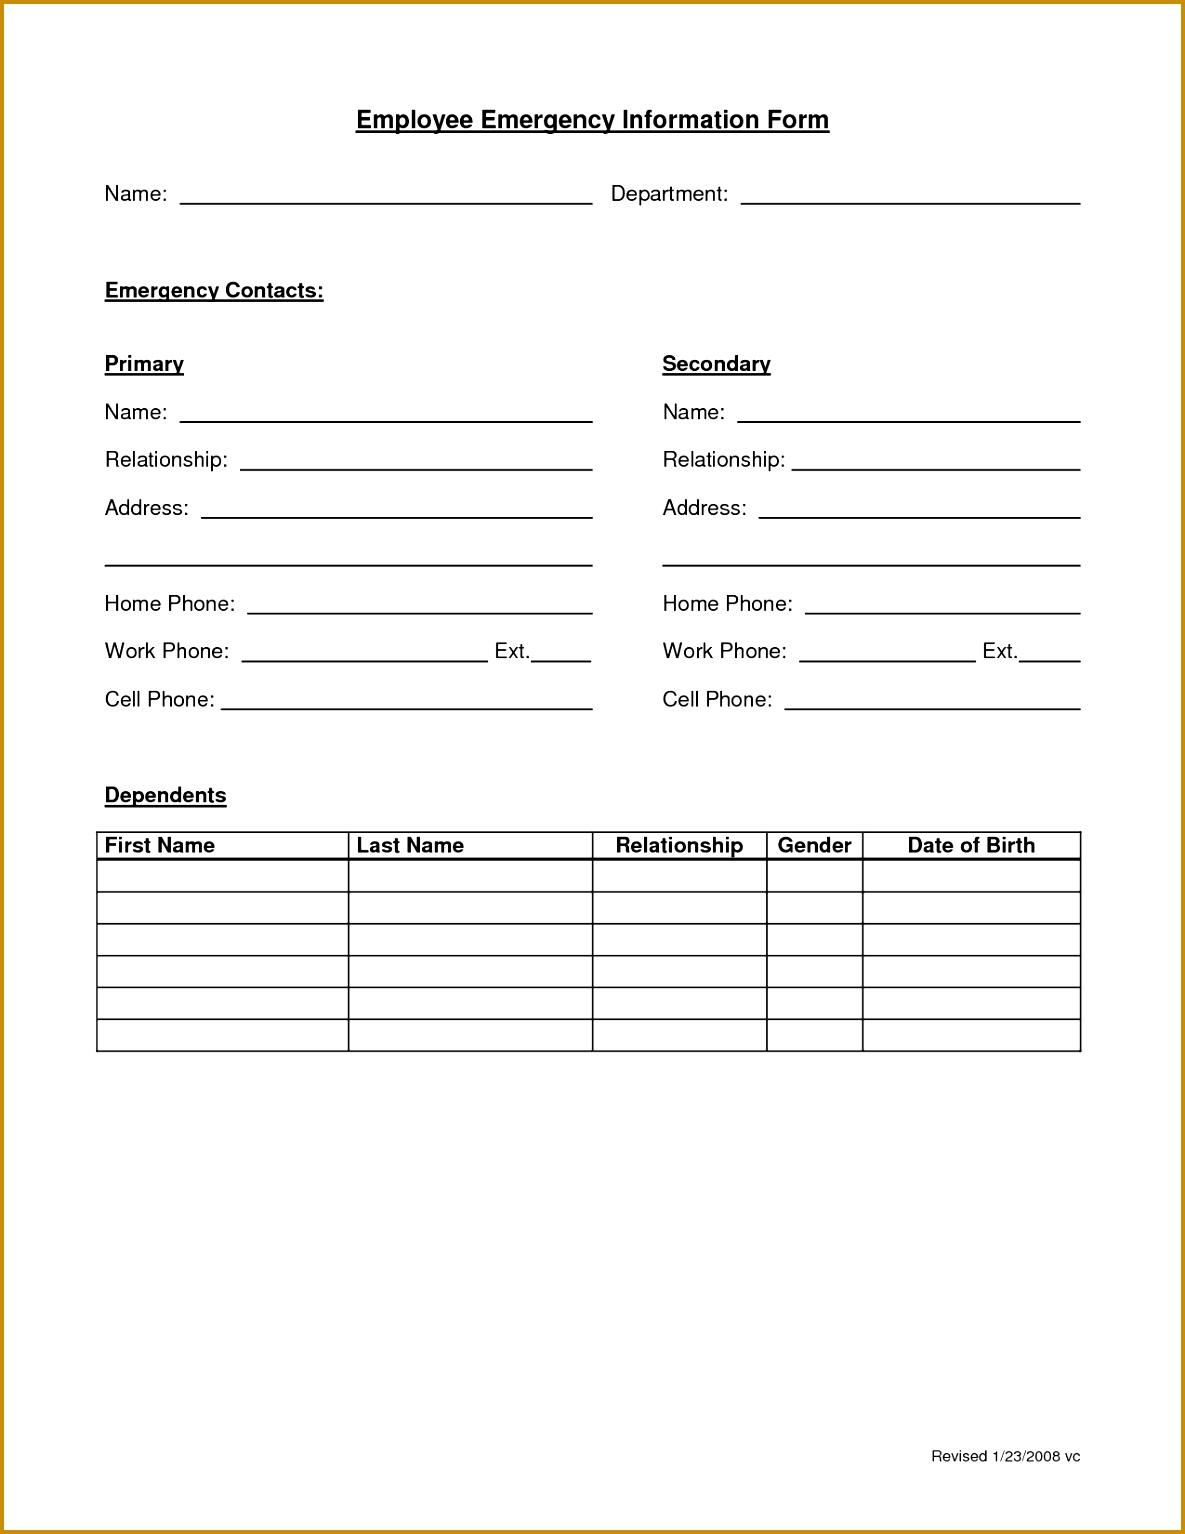 Employee Emergency Form 15341185